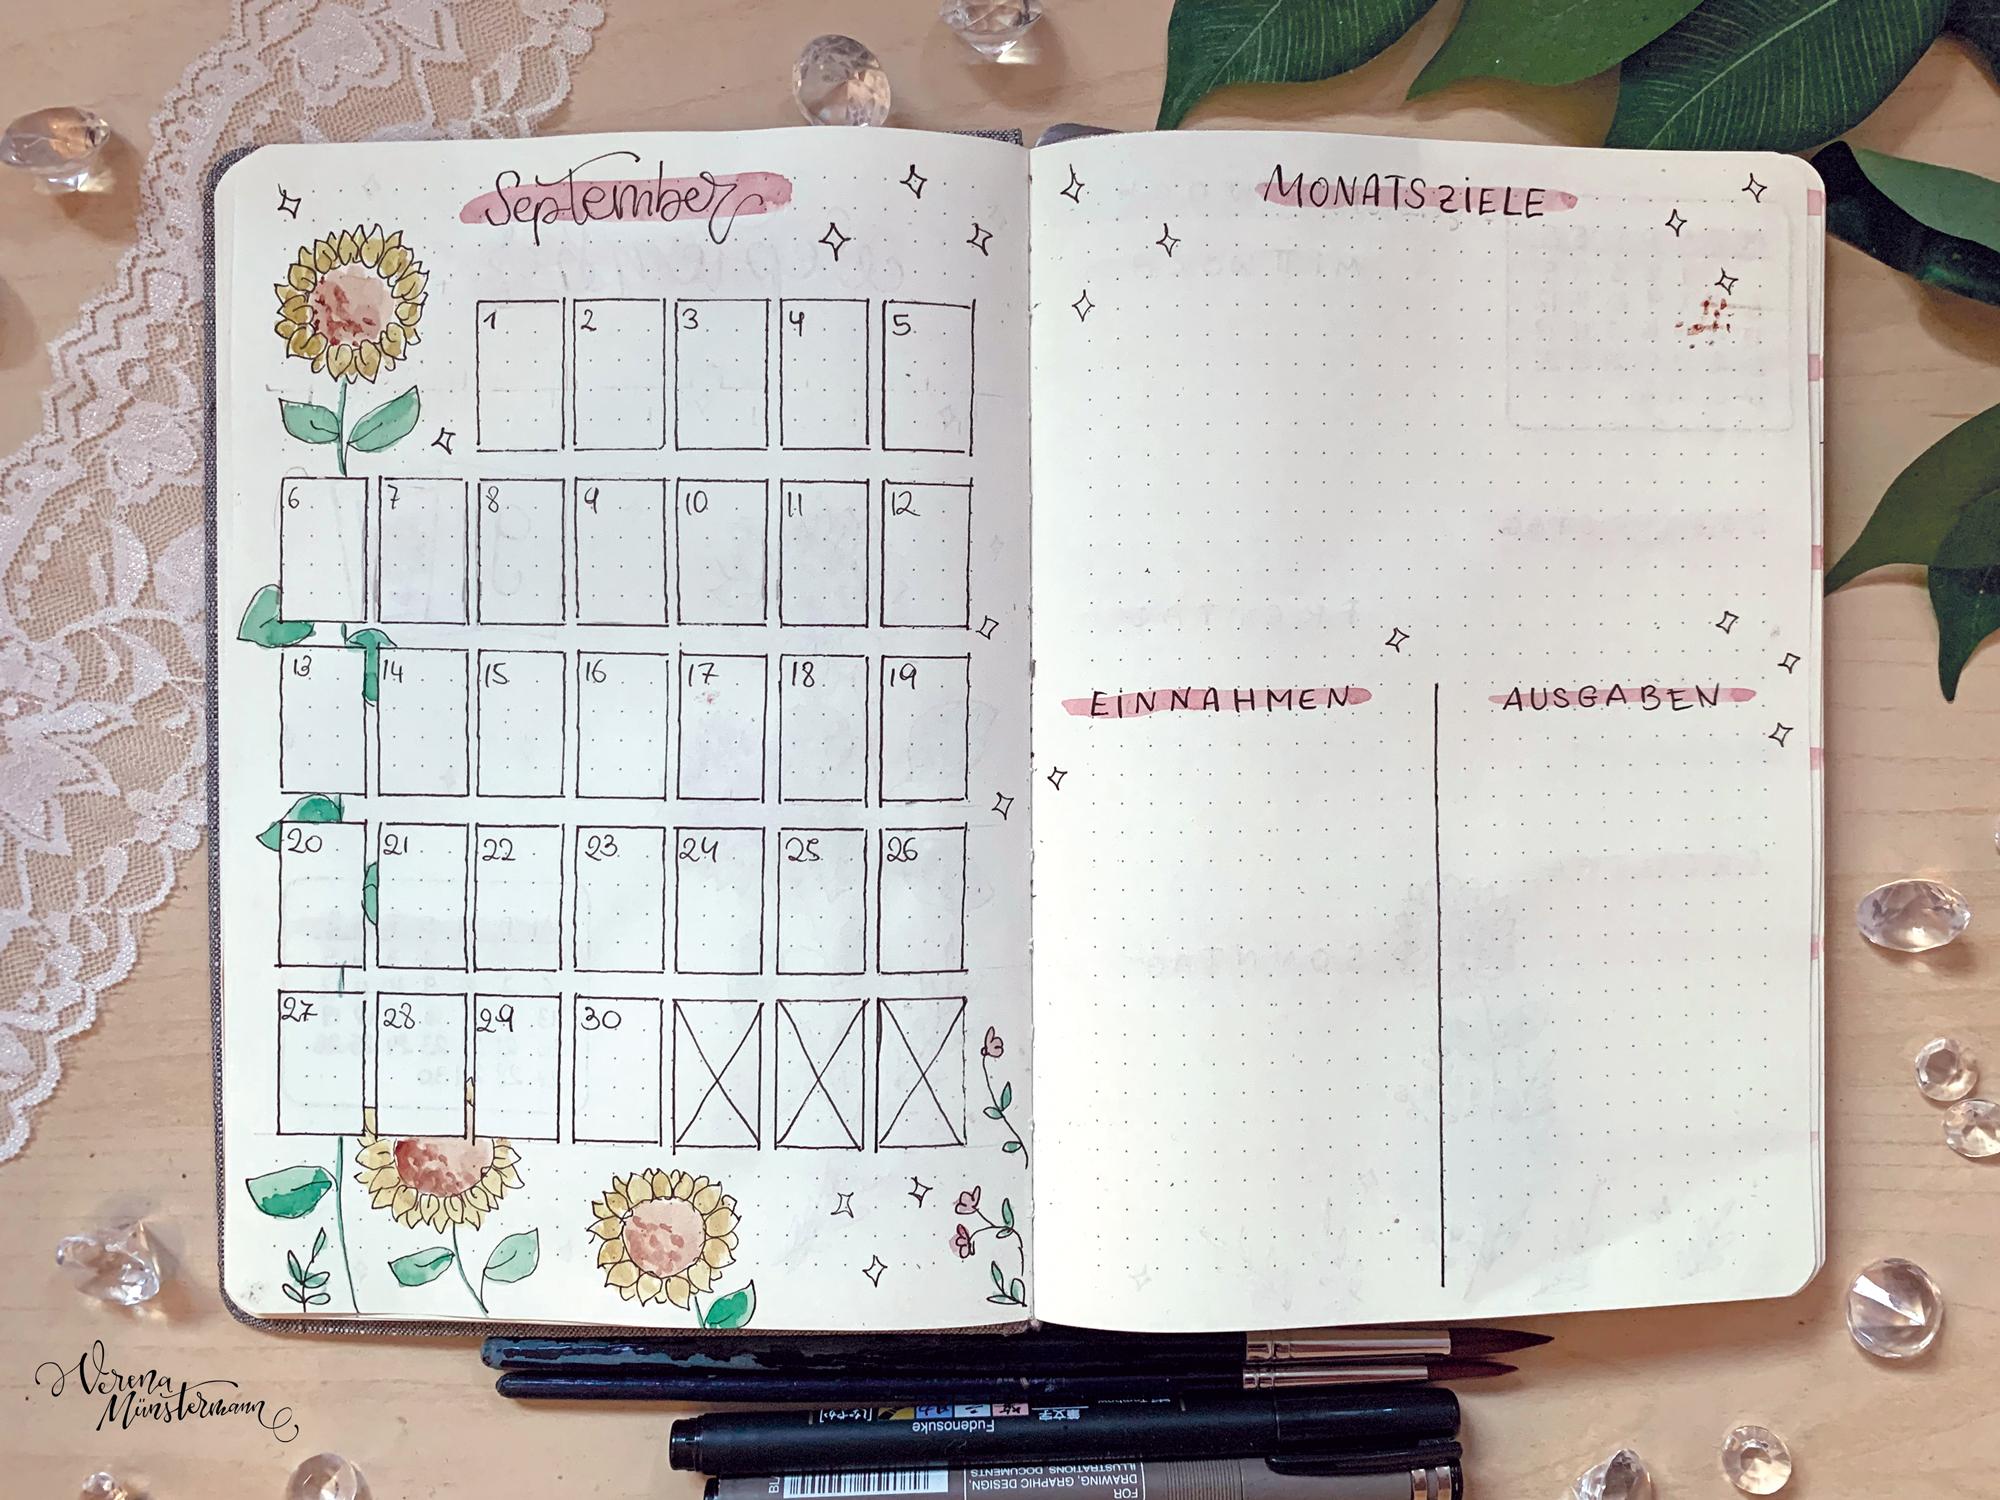 verenamuenstermann - Journal - Wochenübersicht - September